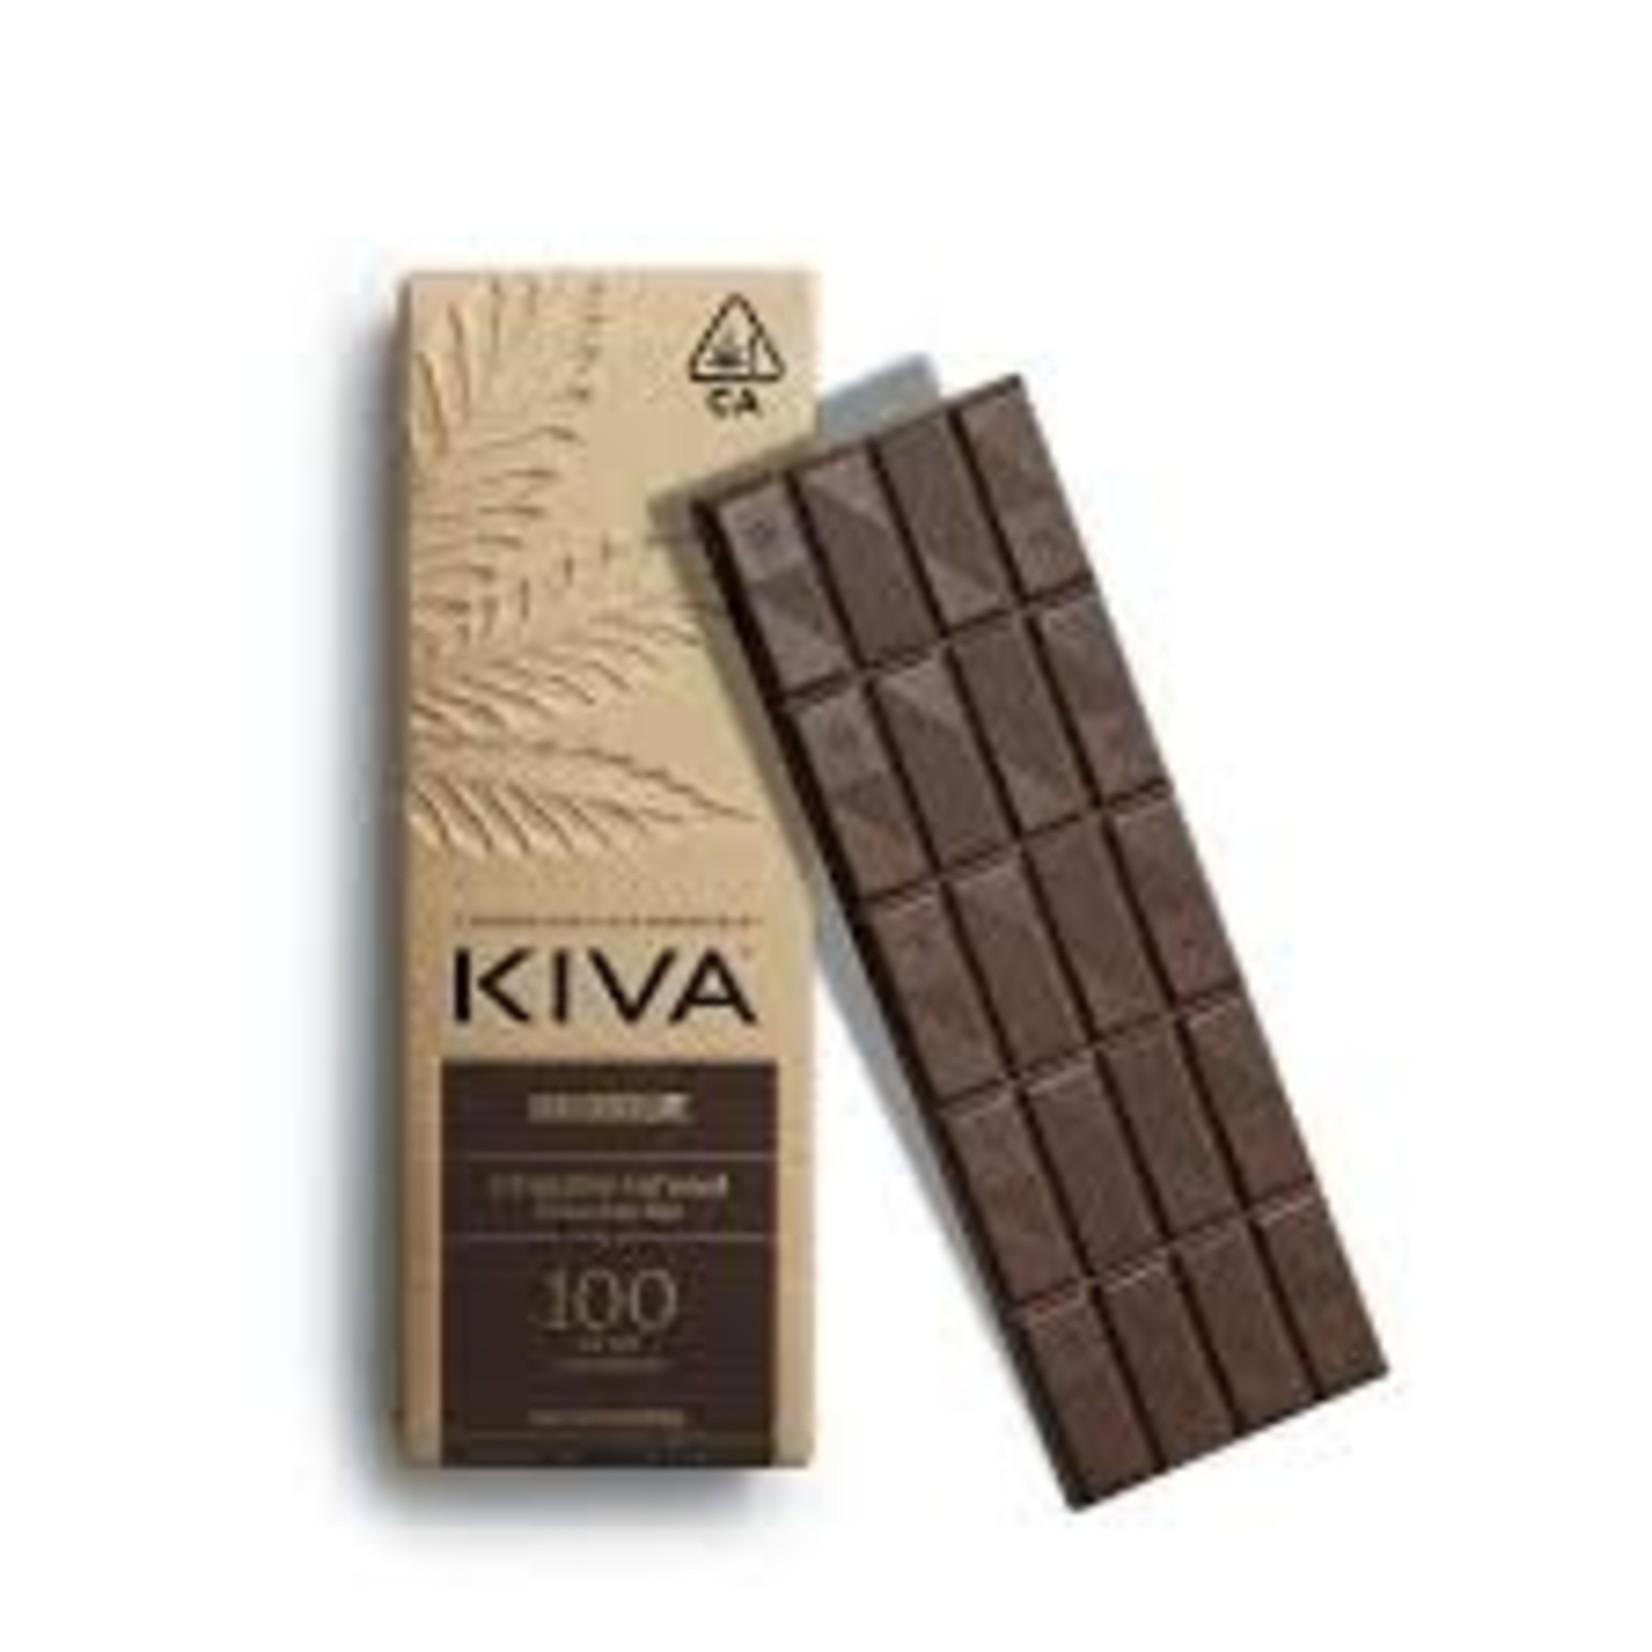 Kiva / Dark Chocolate